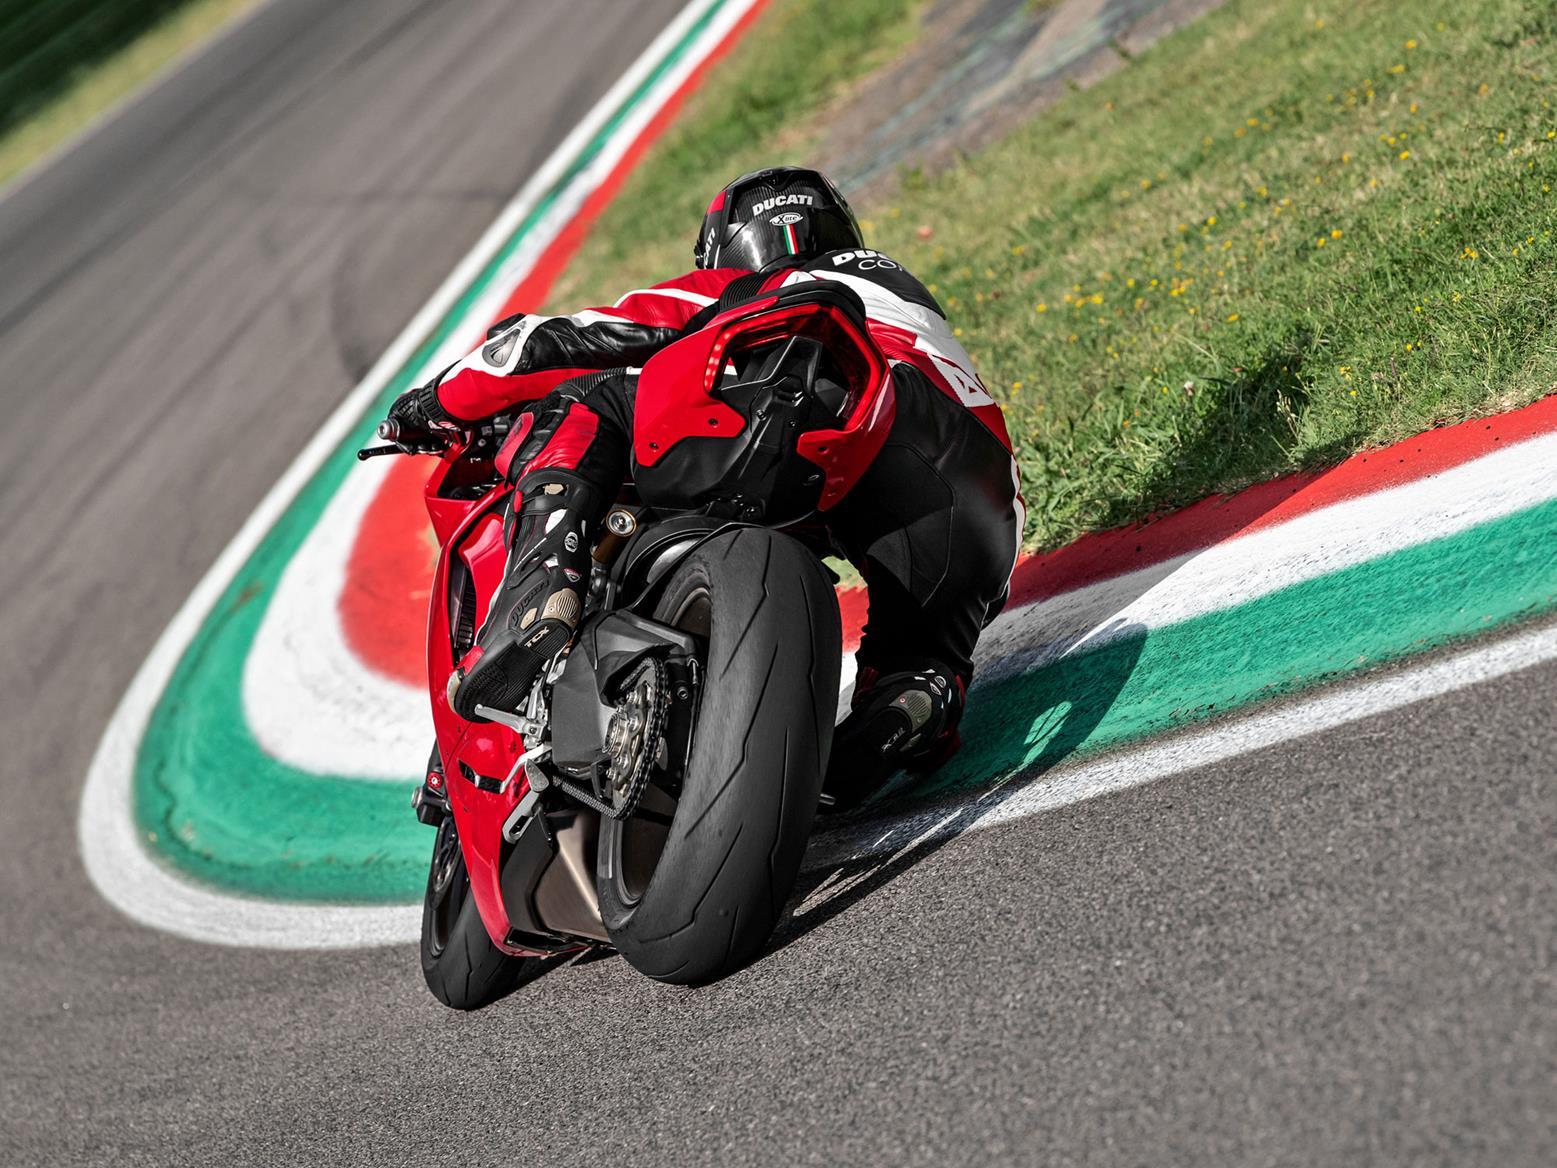 Ducati Panigale V2 knee down cornering shot